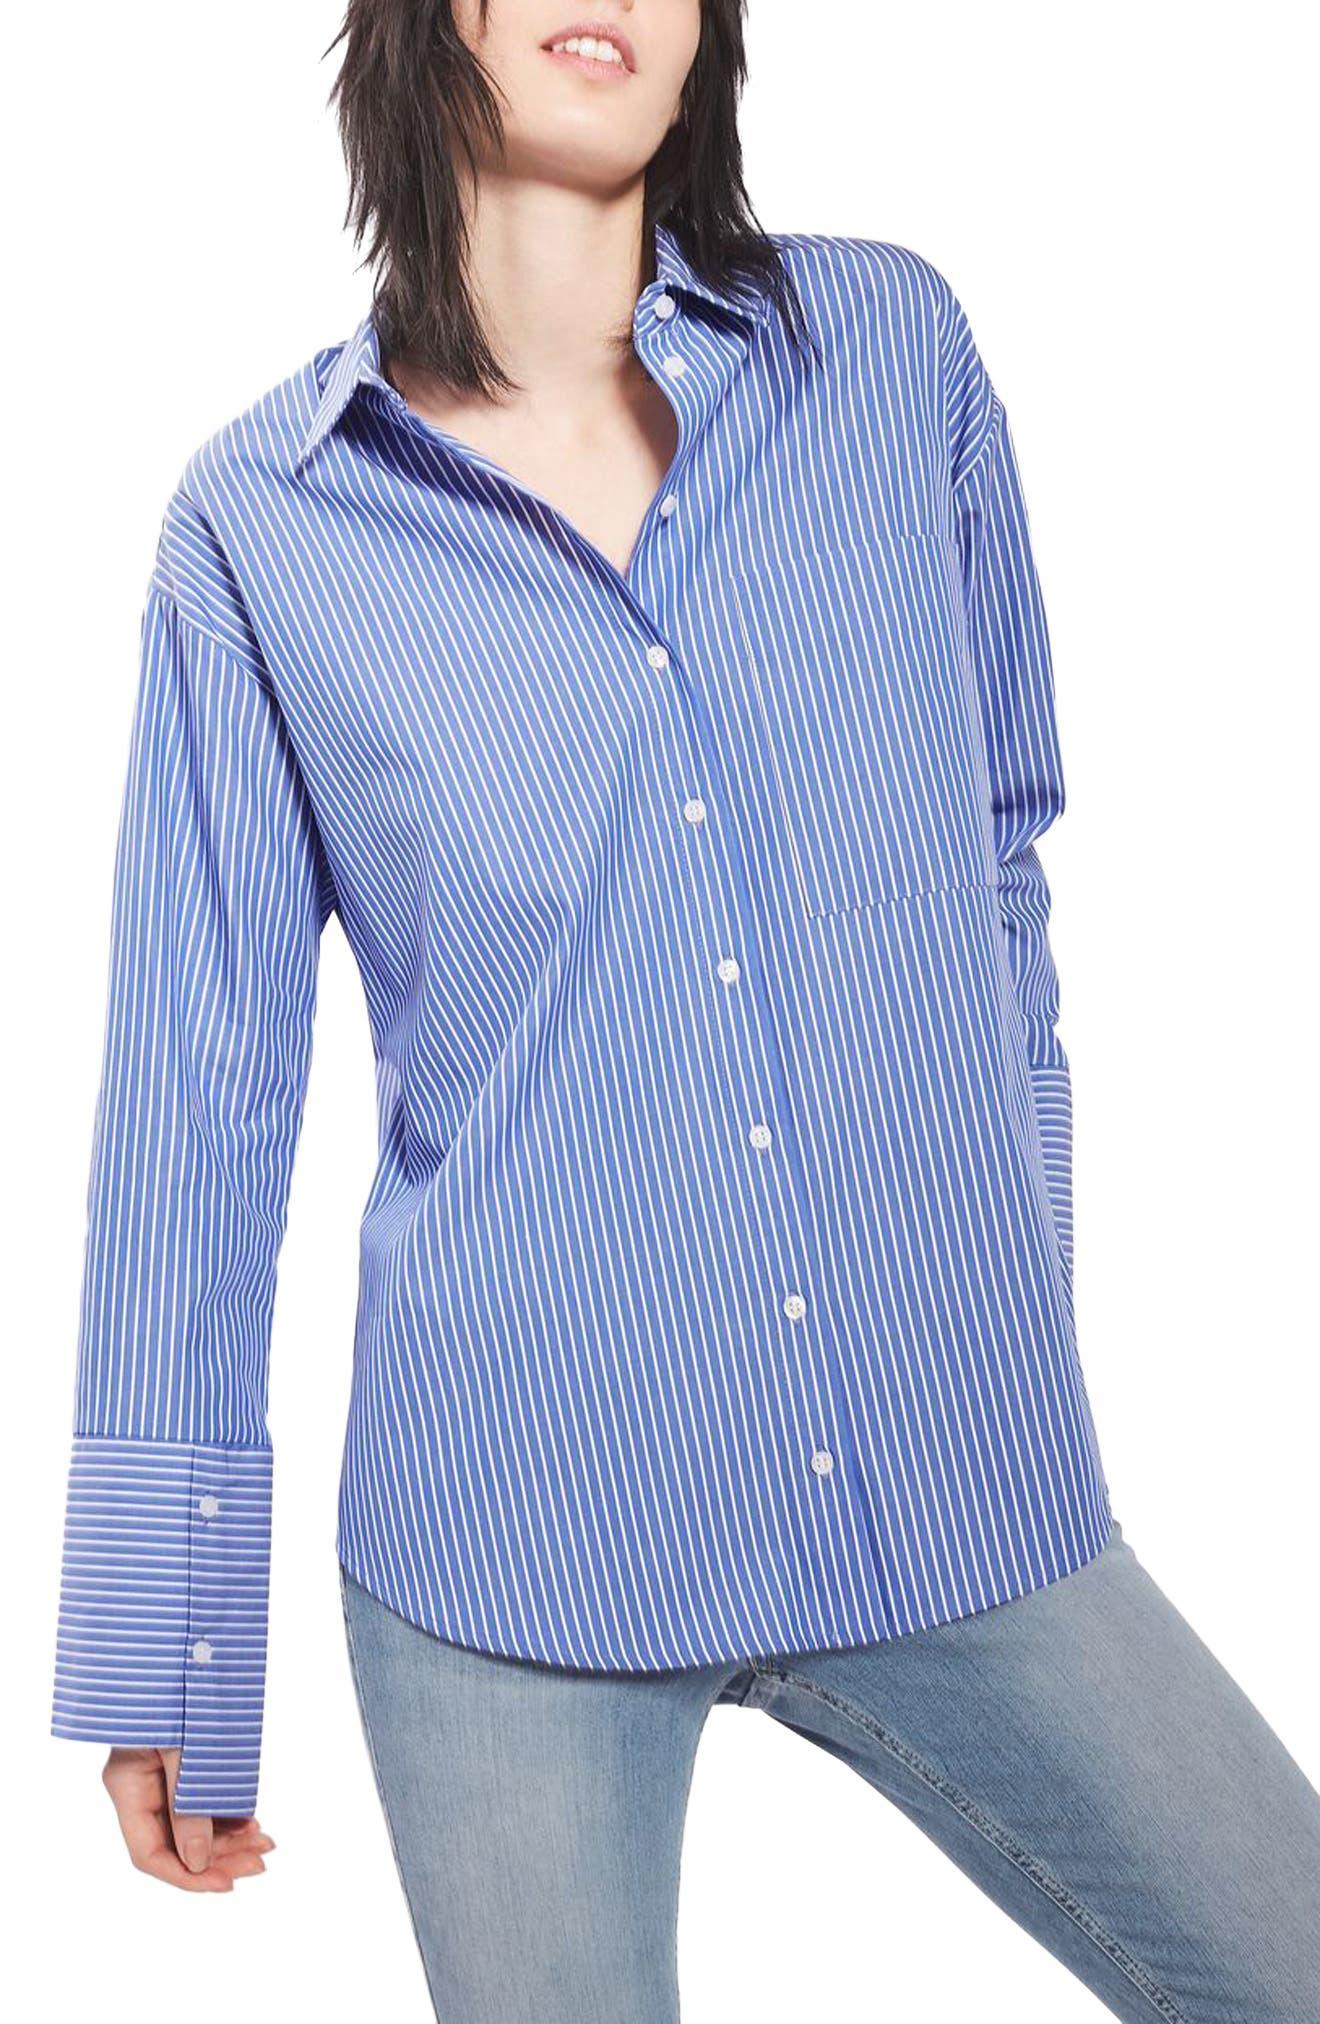 Alternate Image 1 Selected - Topshop Deep Cuff Stripe Shirt